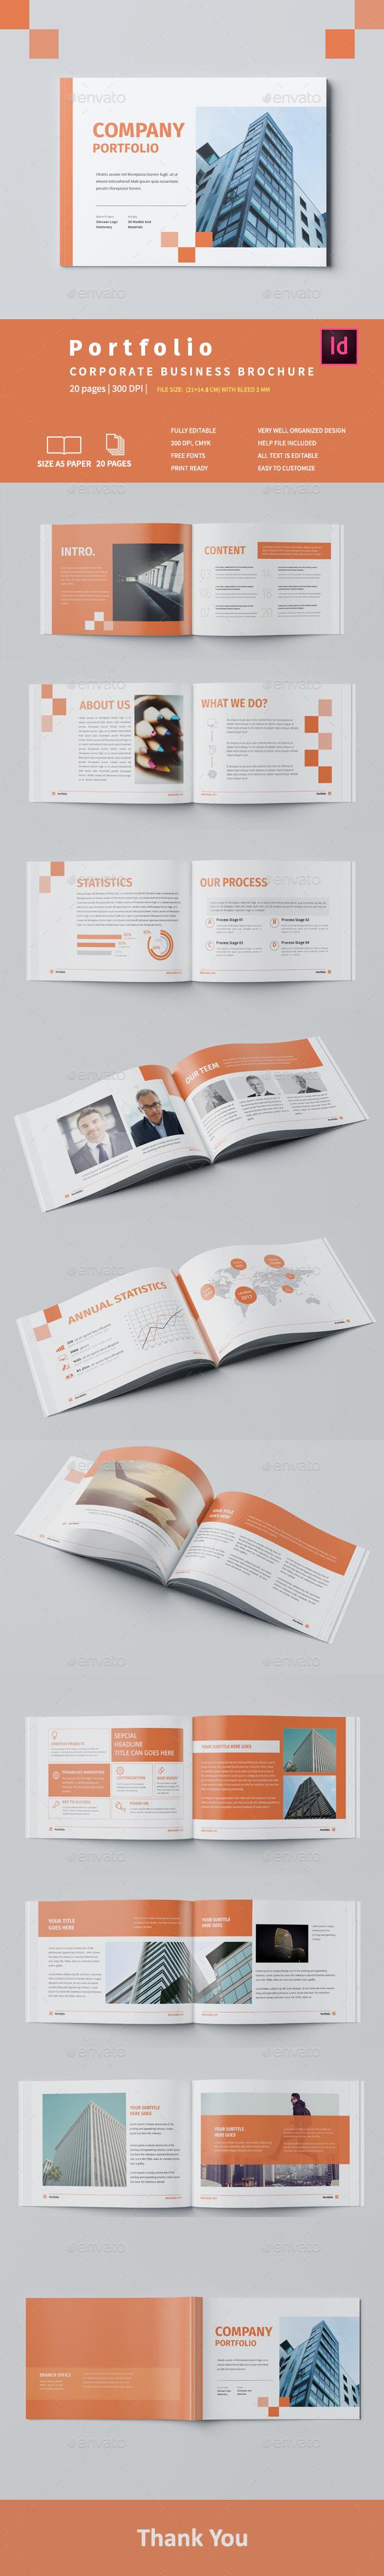 COMPANY PORTFOLIO 2017 - Corporate Brochures